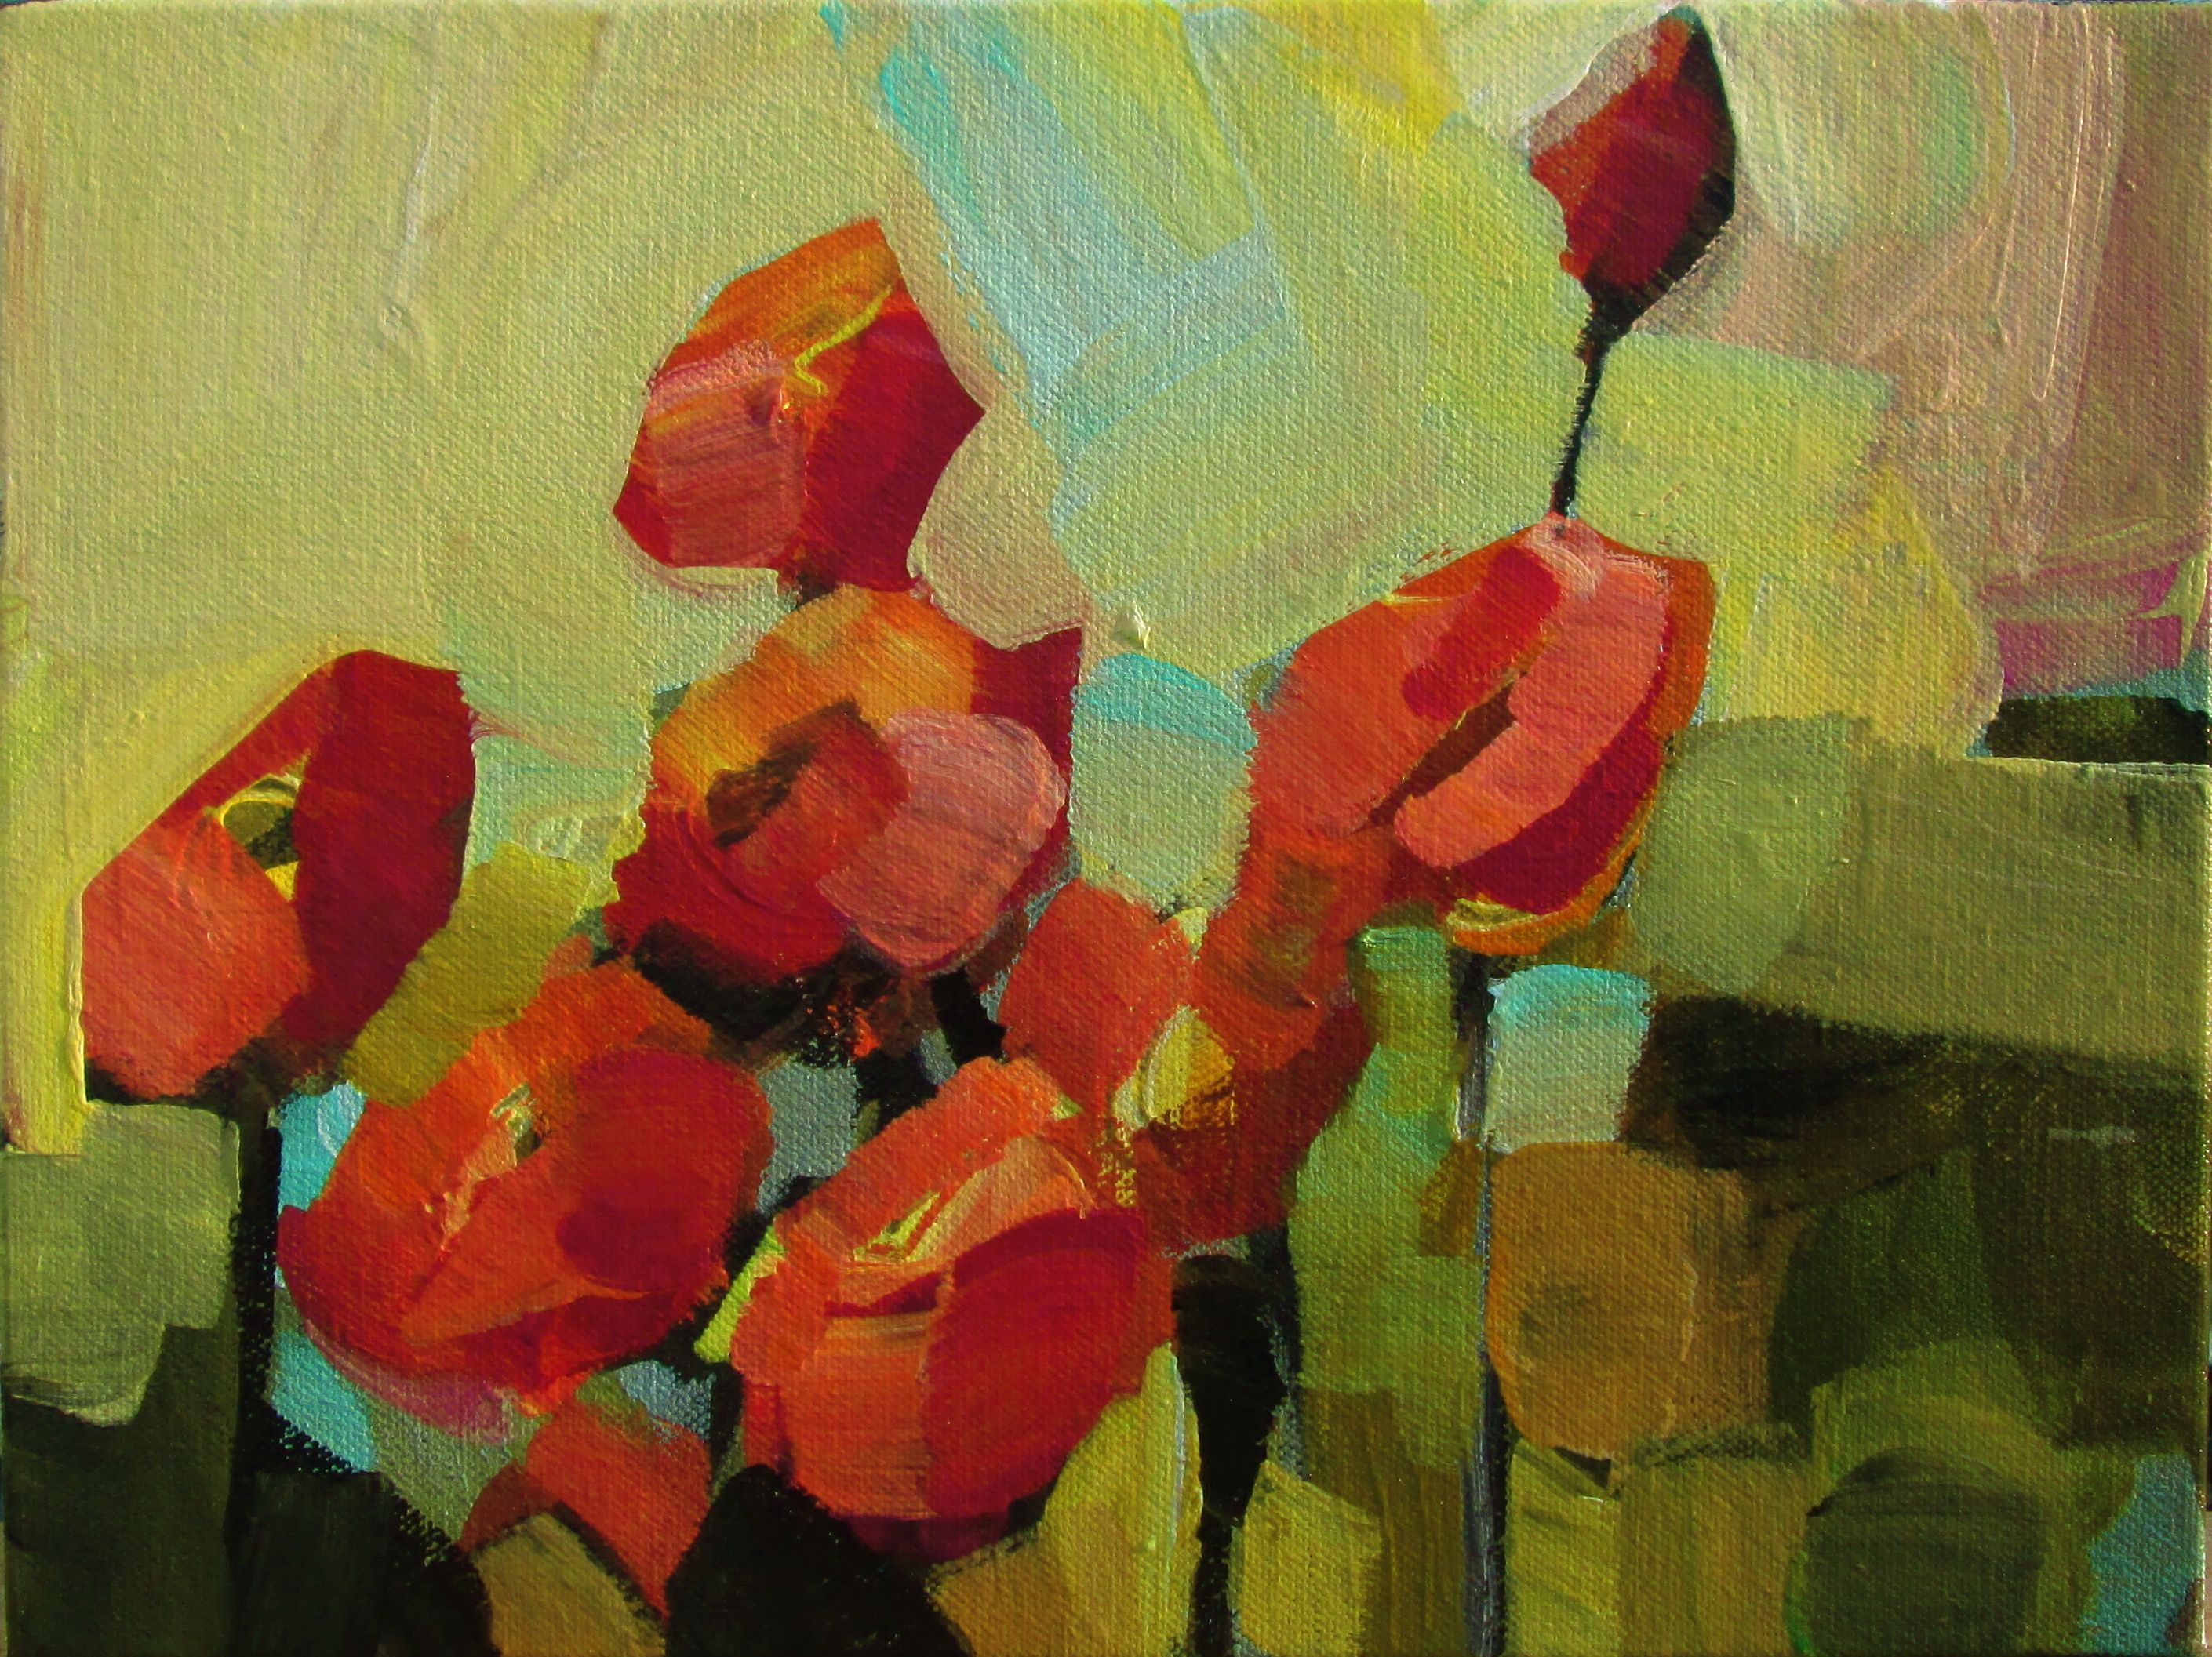 jillvansickle.com   artwork, painting, decor, art, floral, poppies, red